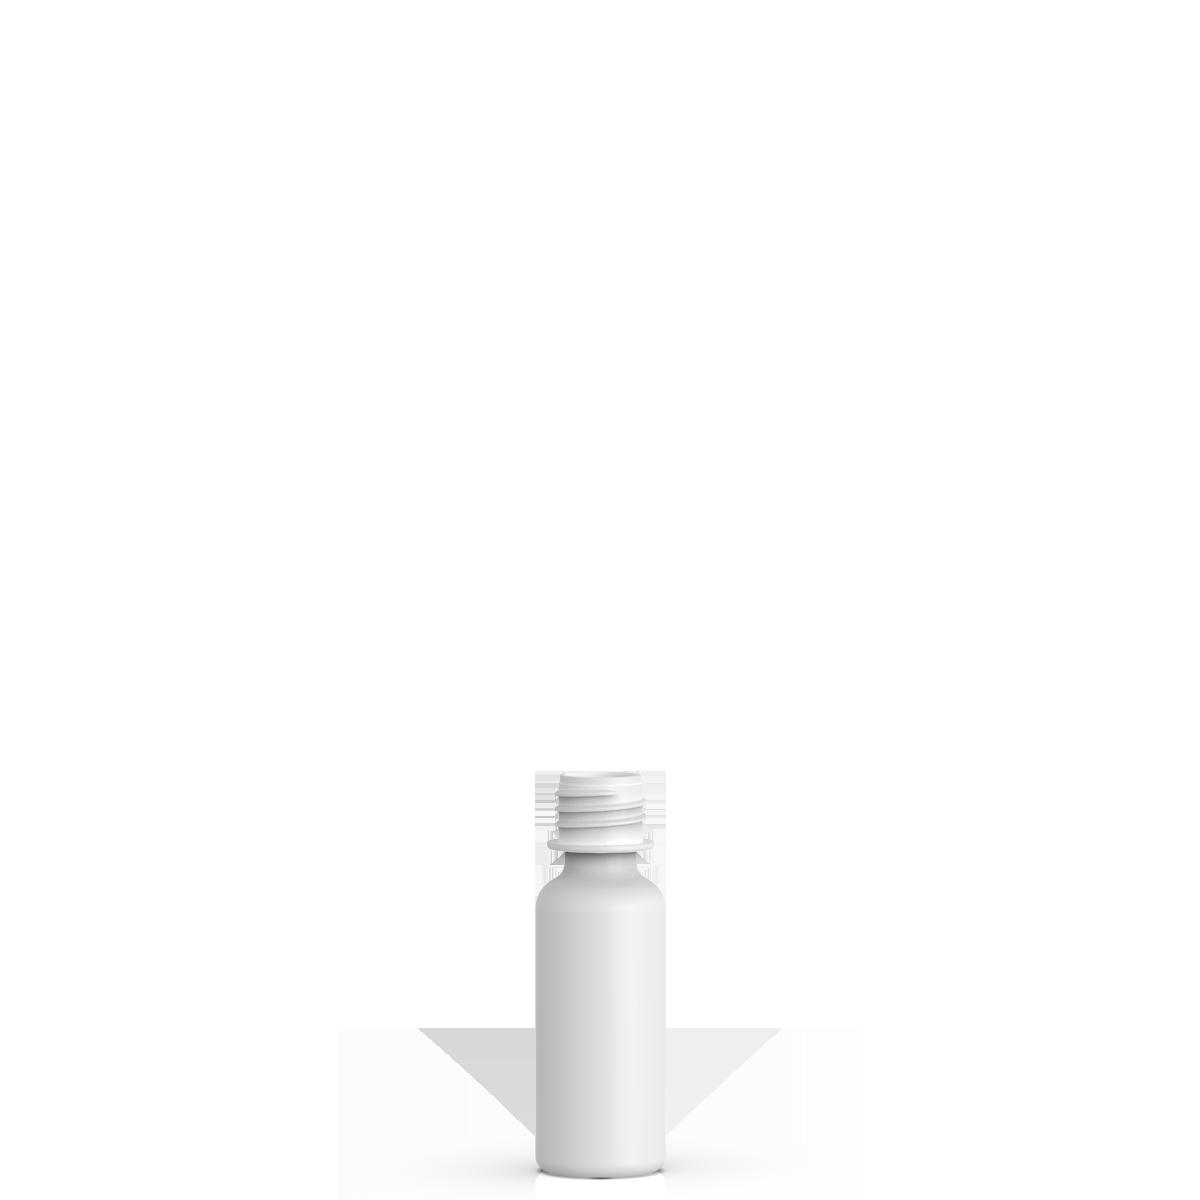 Cylindrical phial 20 ml HDPE, neck 18 mm, style ZANZIBAR